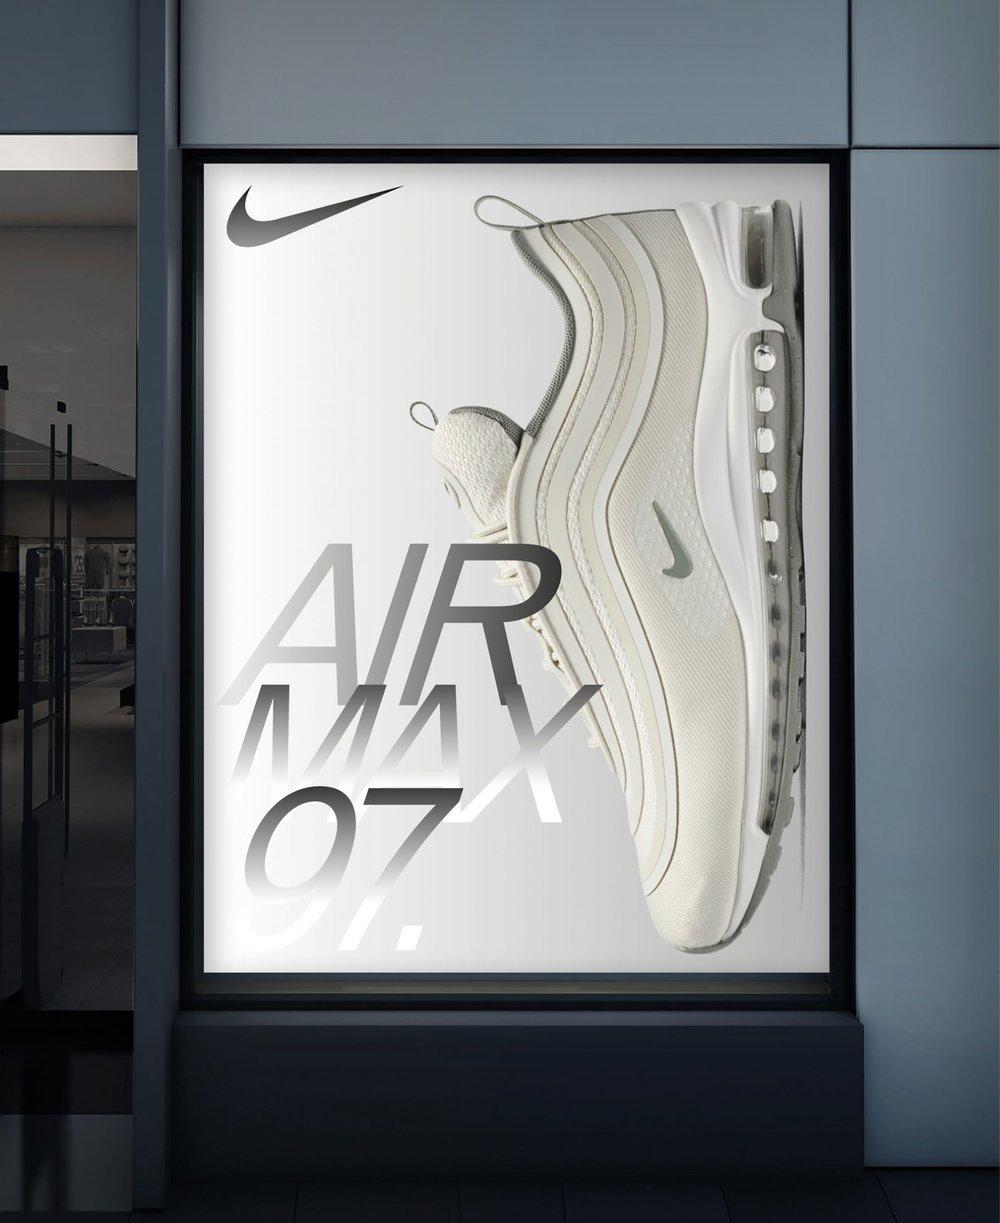 Hort_Nike_PF_003-1619x1980.jpg